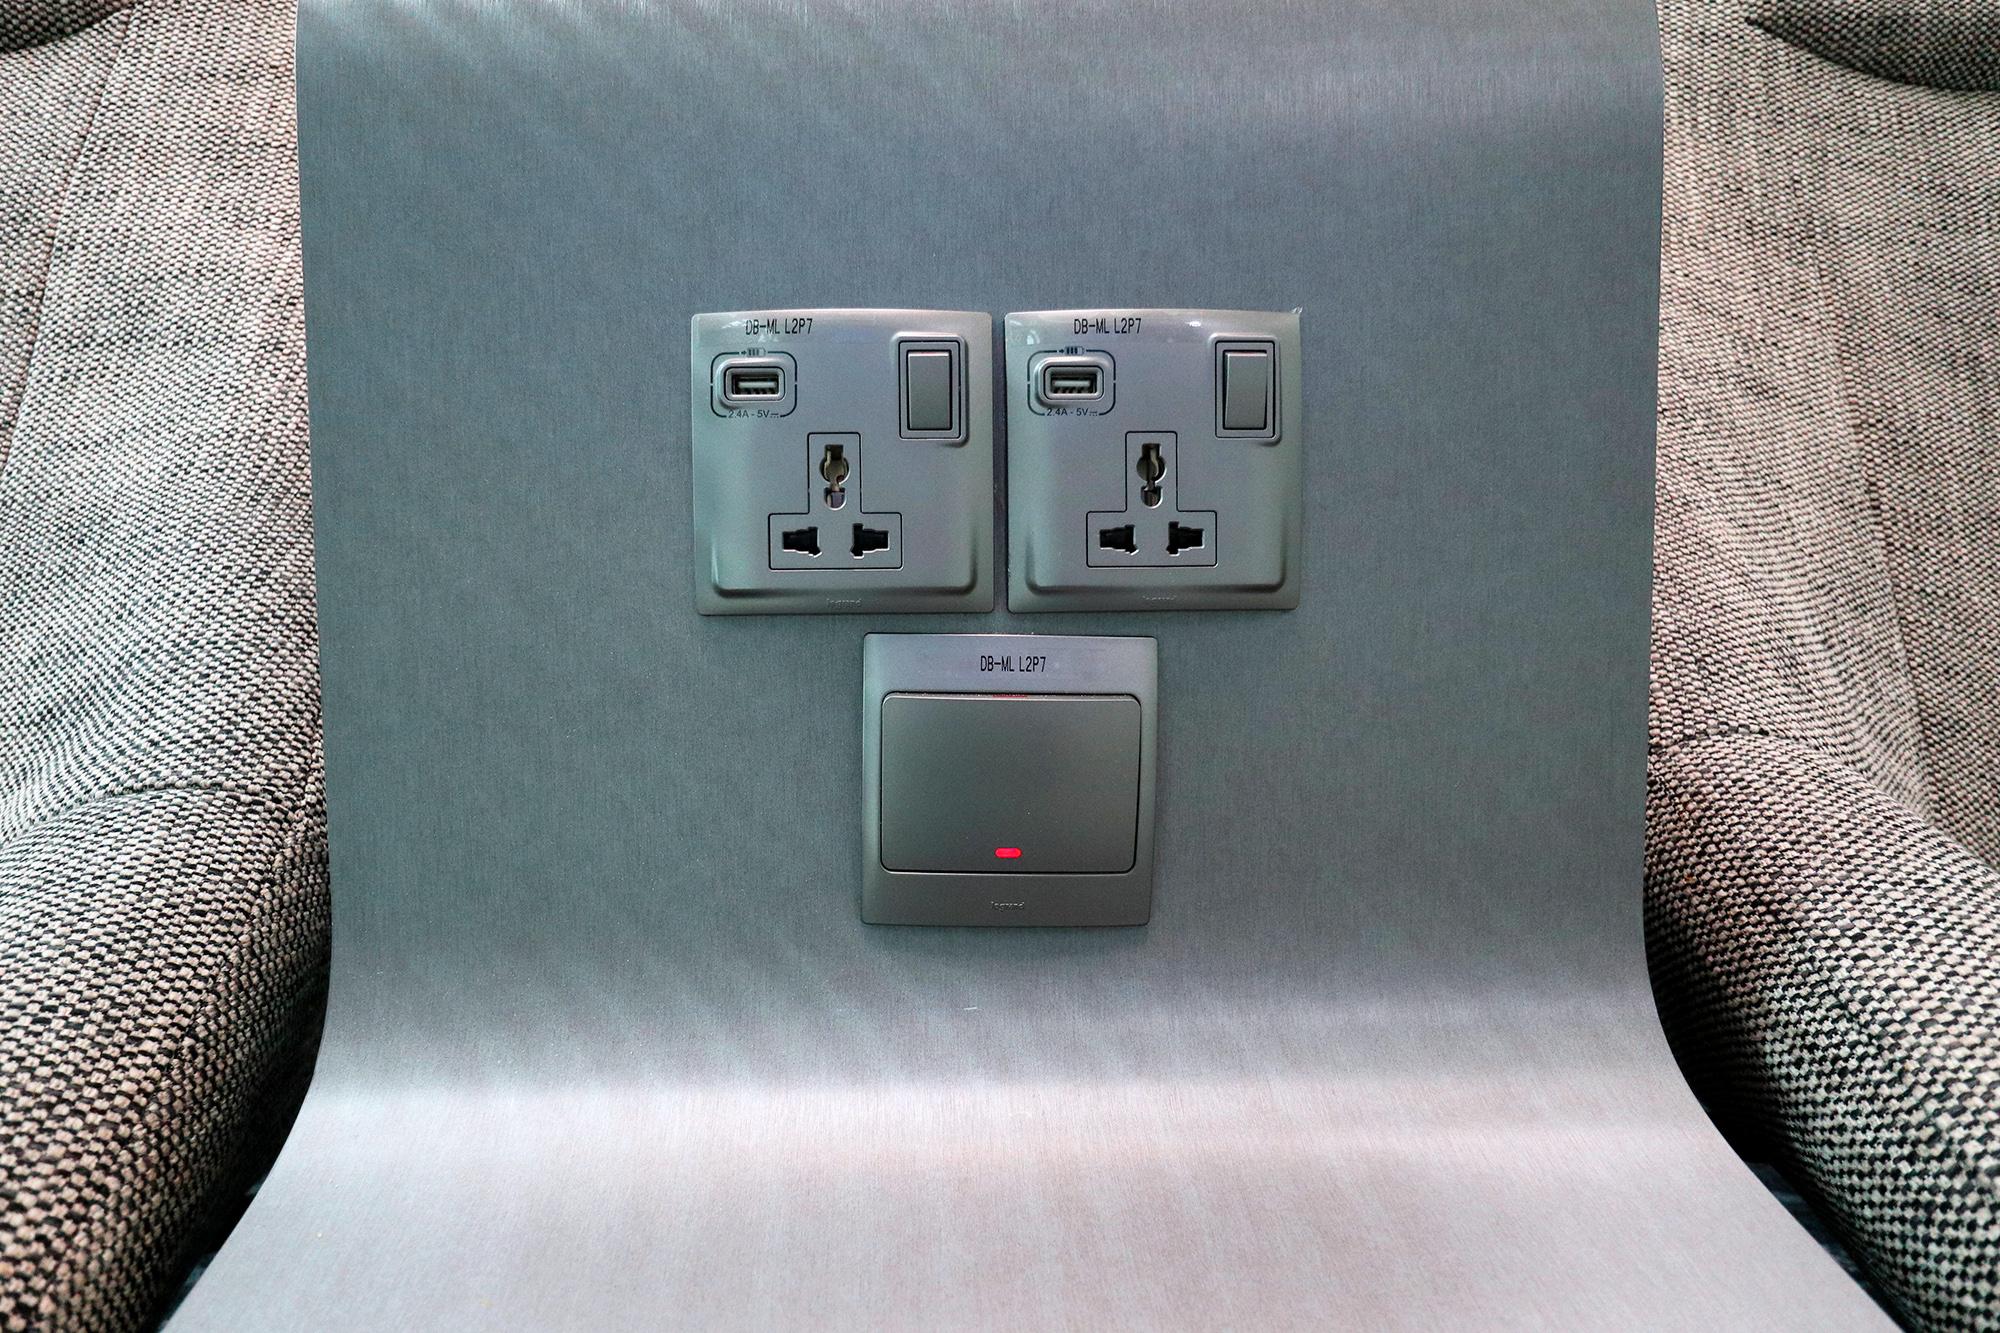 Power Sockets